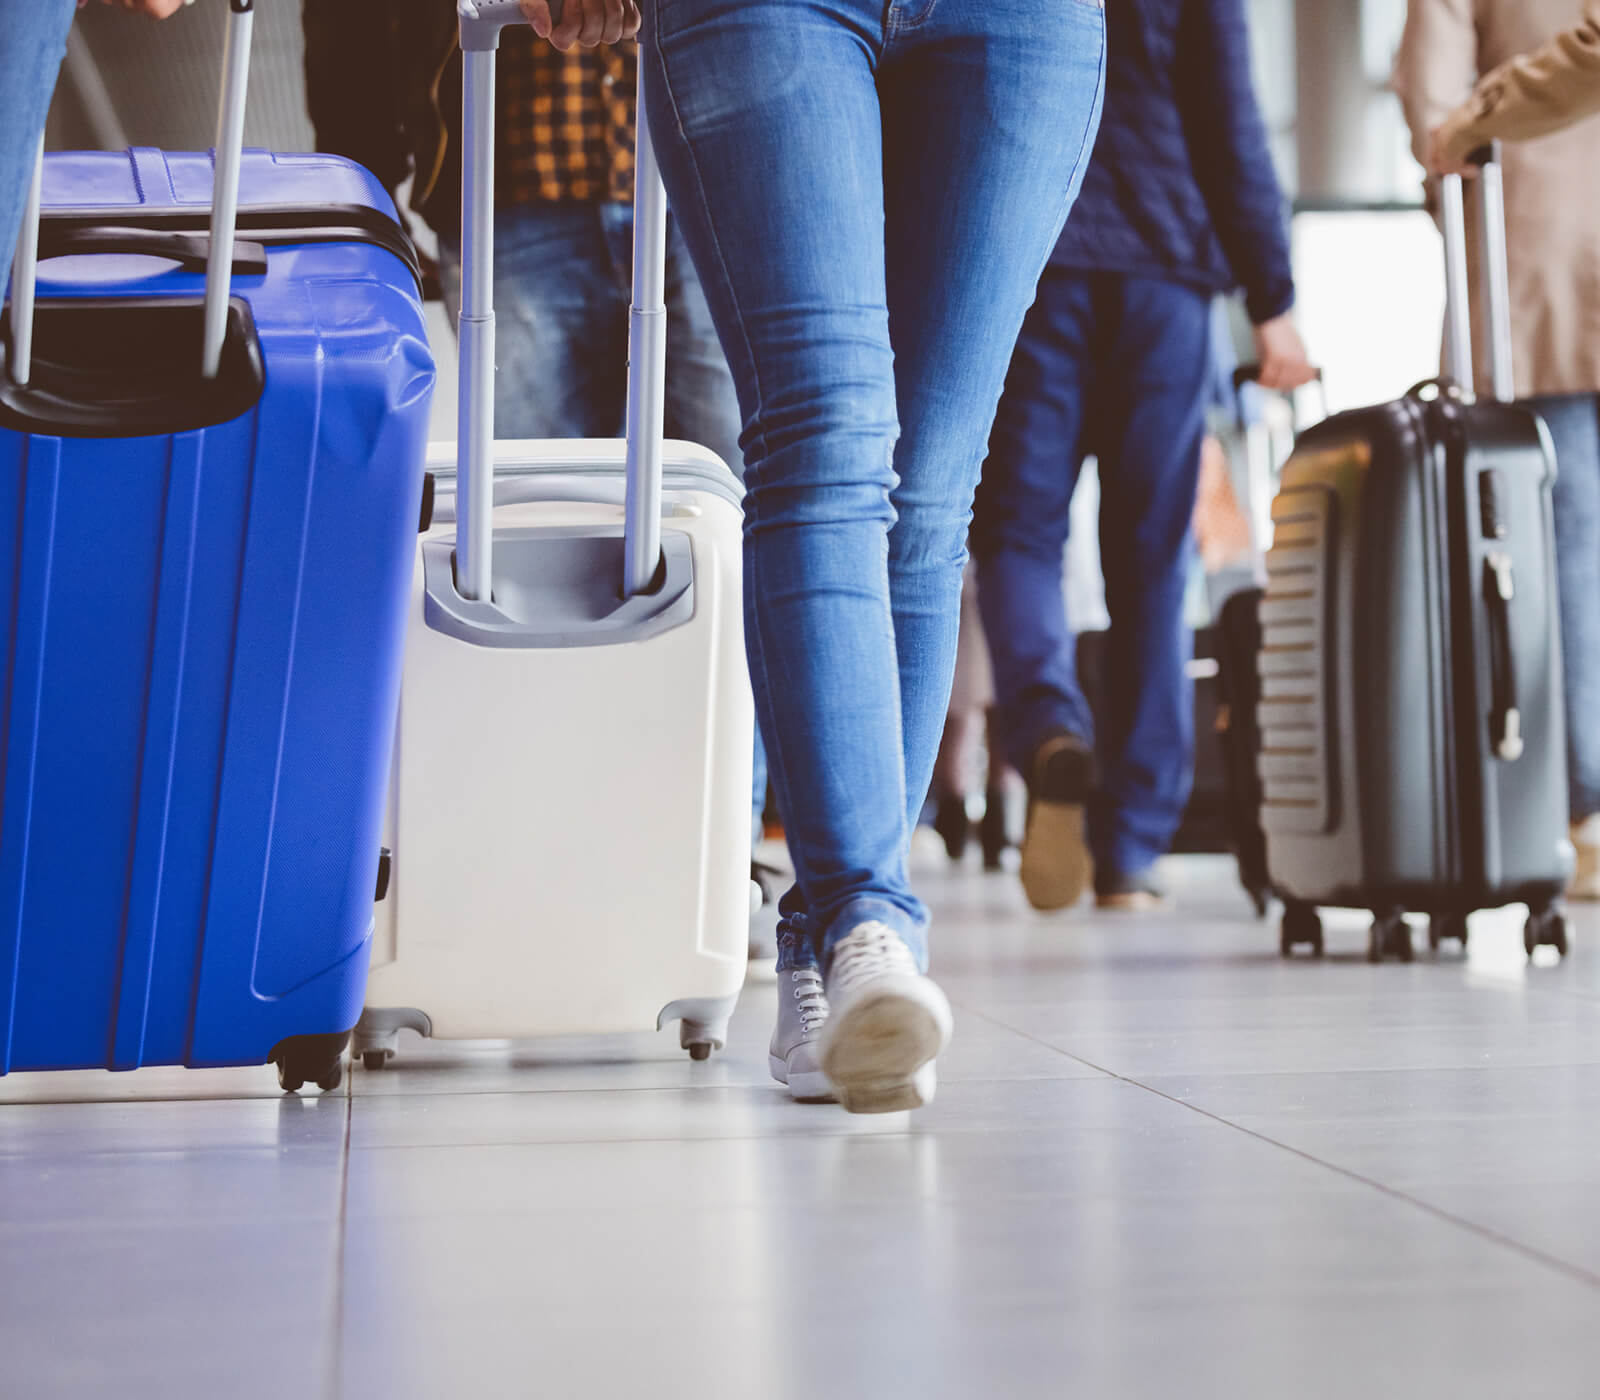 1-holiday-travel-safety-tips.jpg